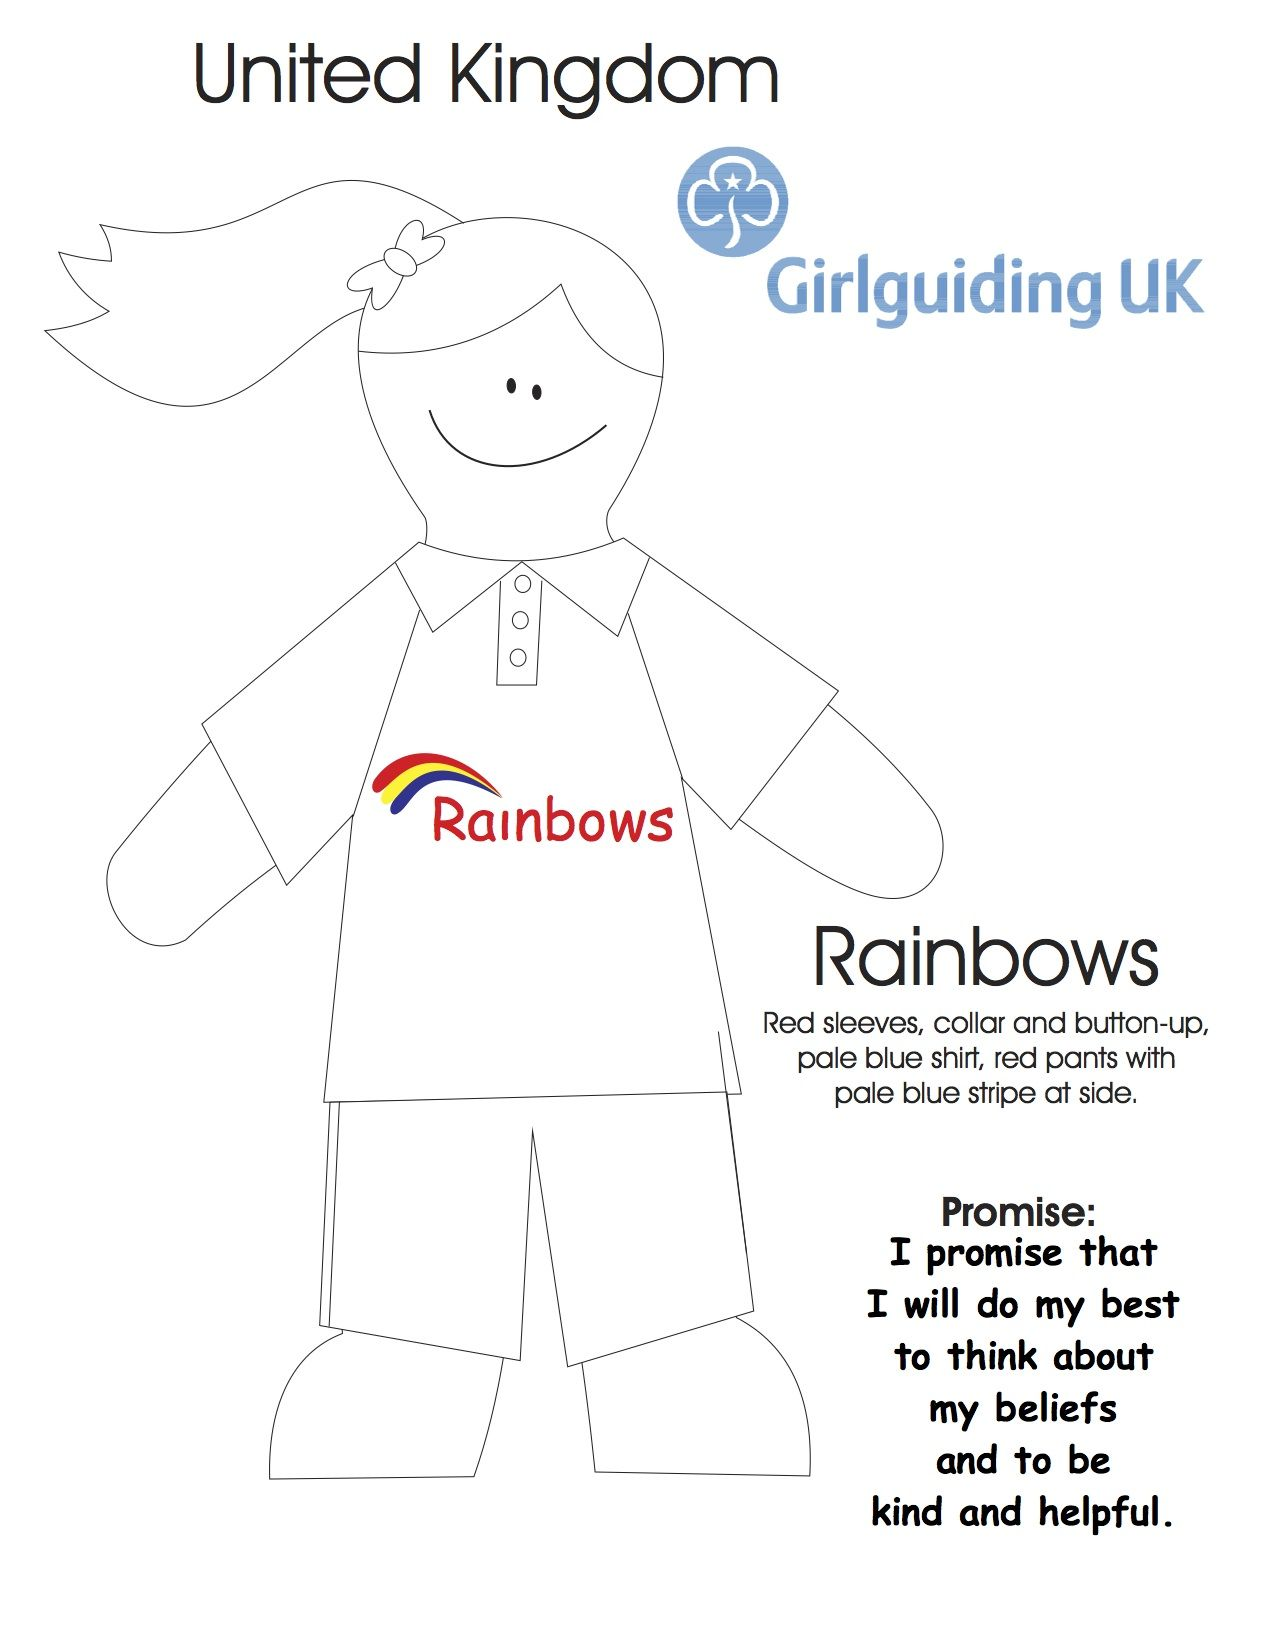 United Kingdom Rainbow Colouring Sheet | girl scouts | Pinterest